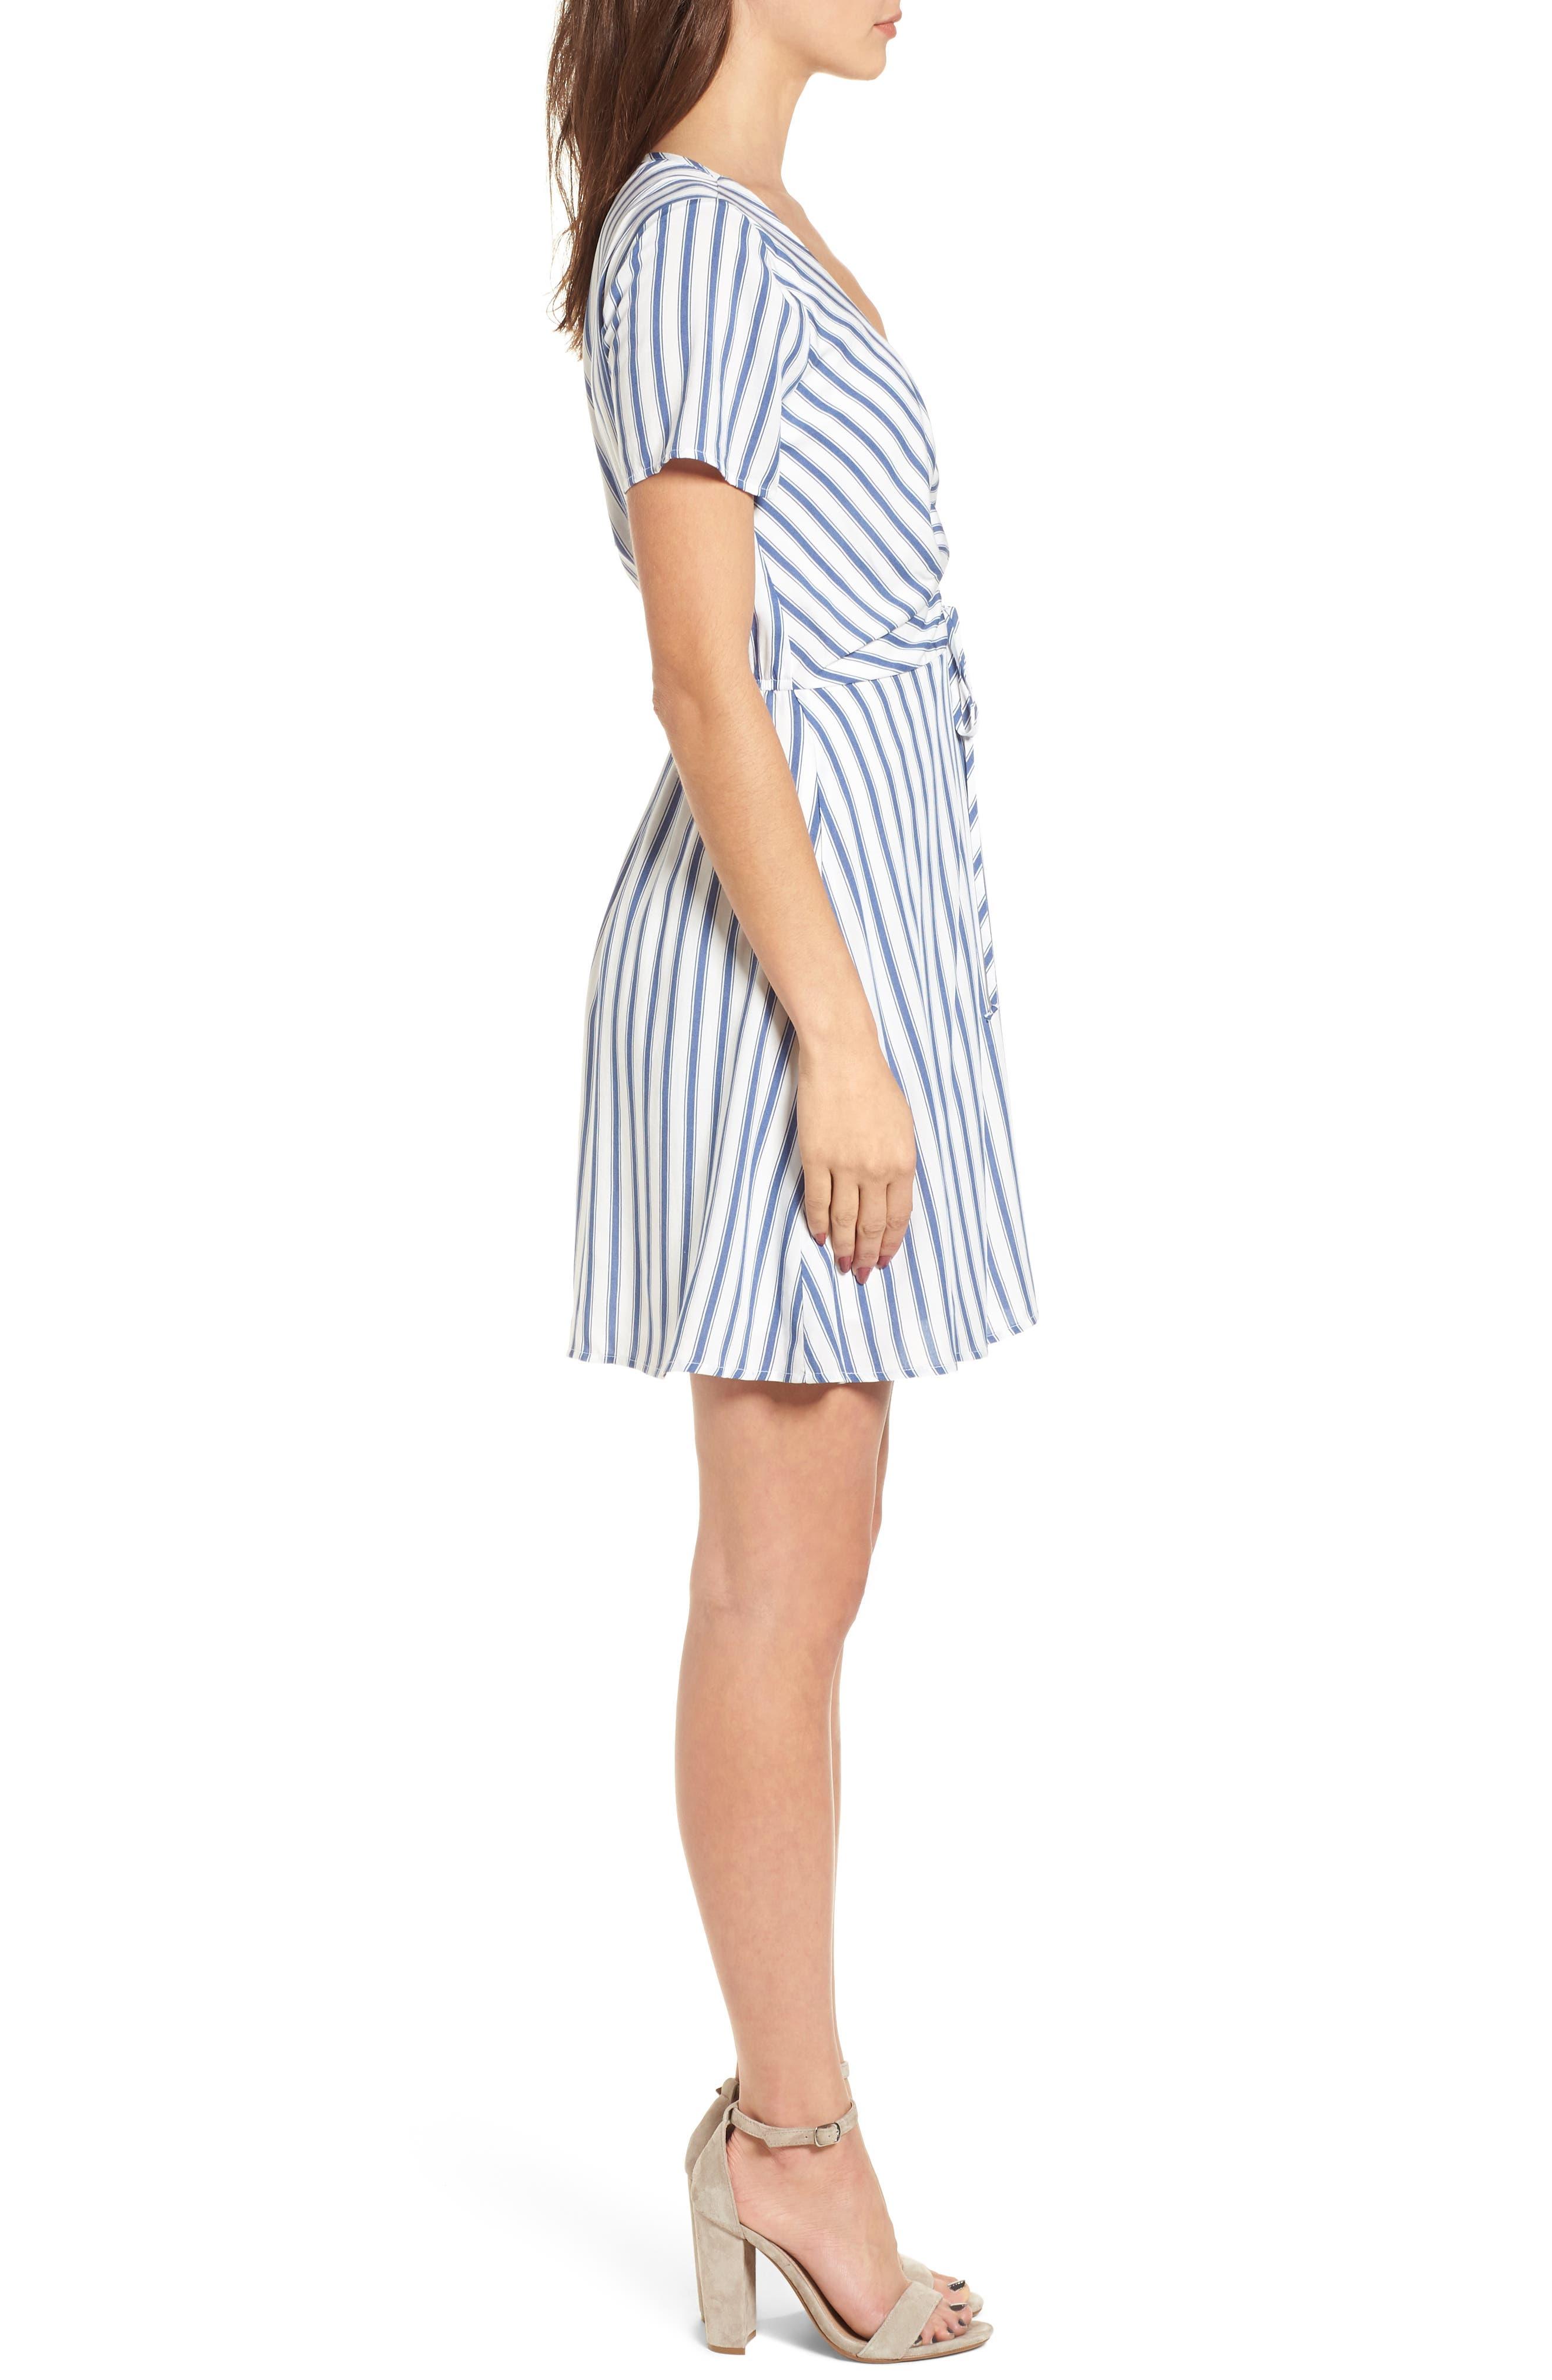 Cinch Front Minidress,                             Alternate thumbnail 3, color,                             Blue/ White Stripe